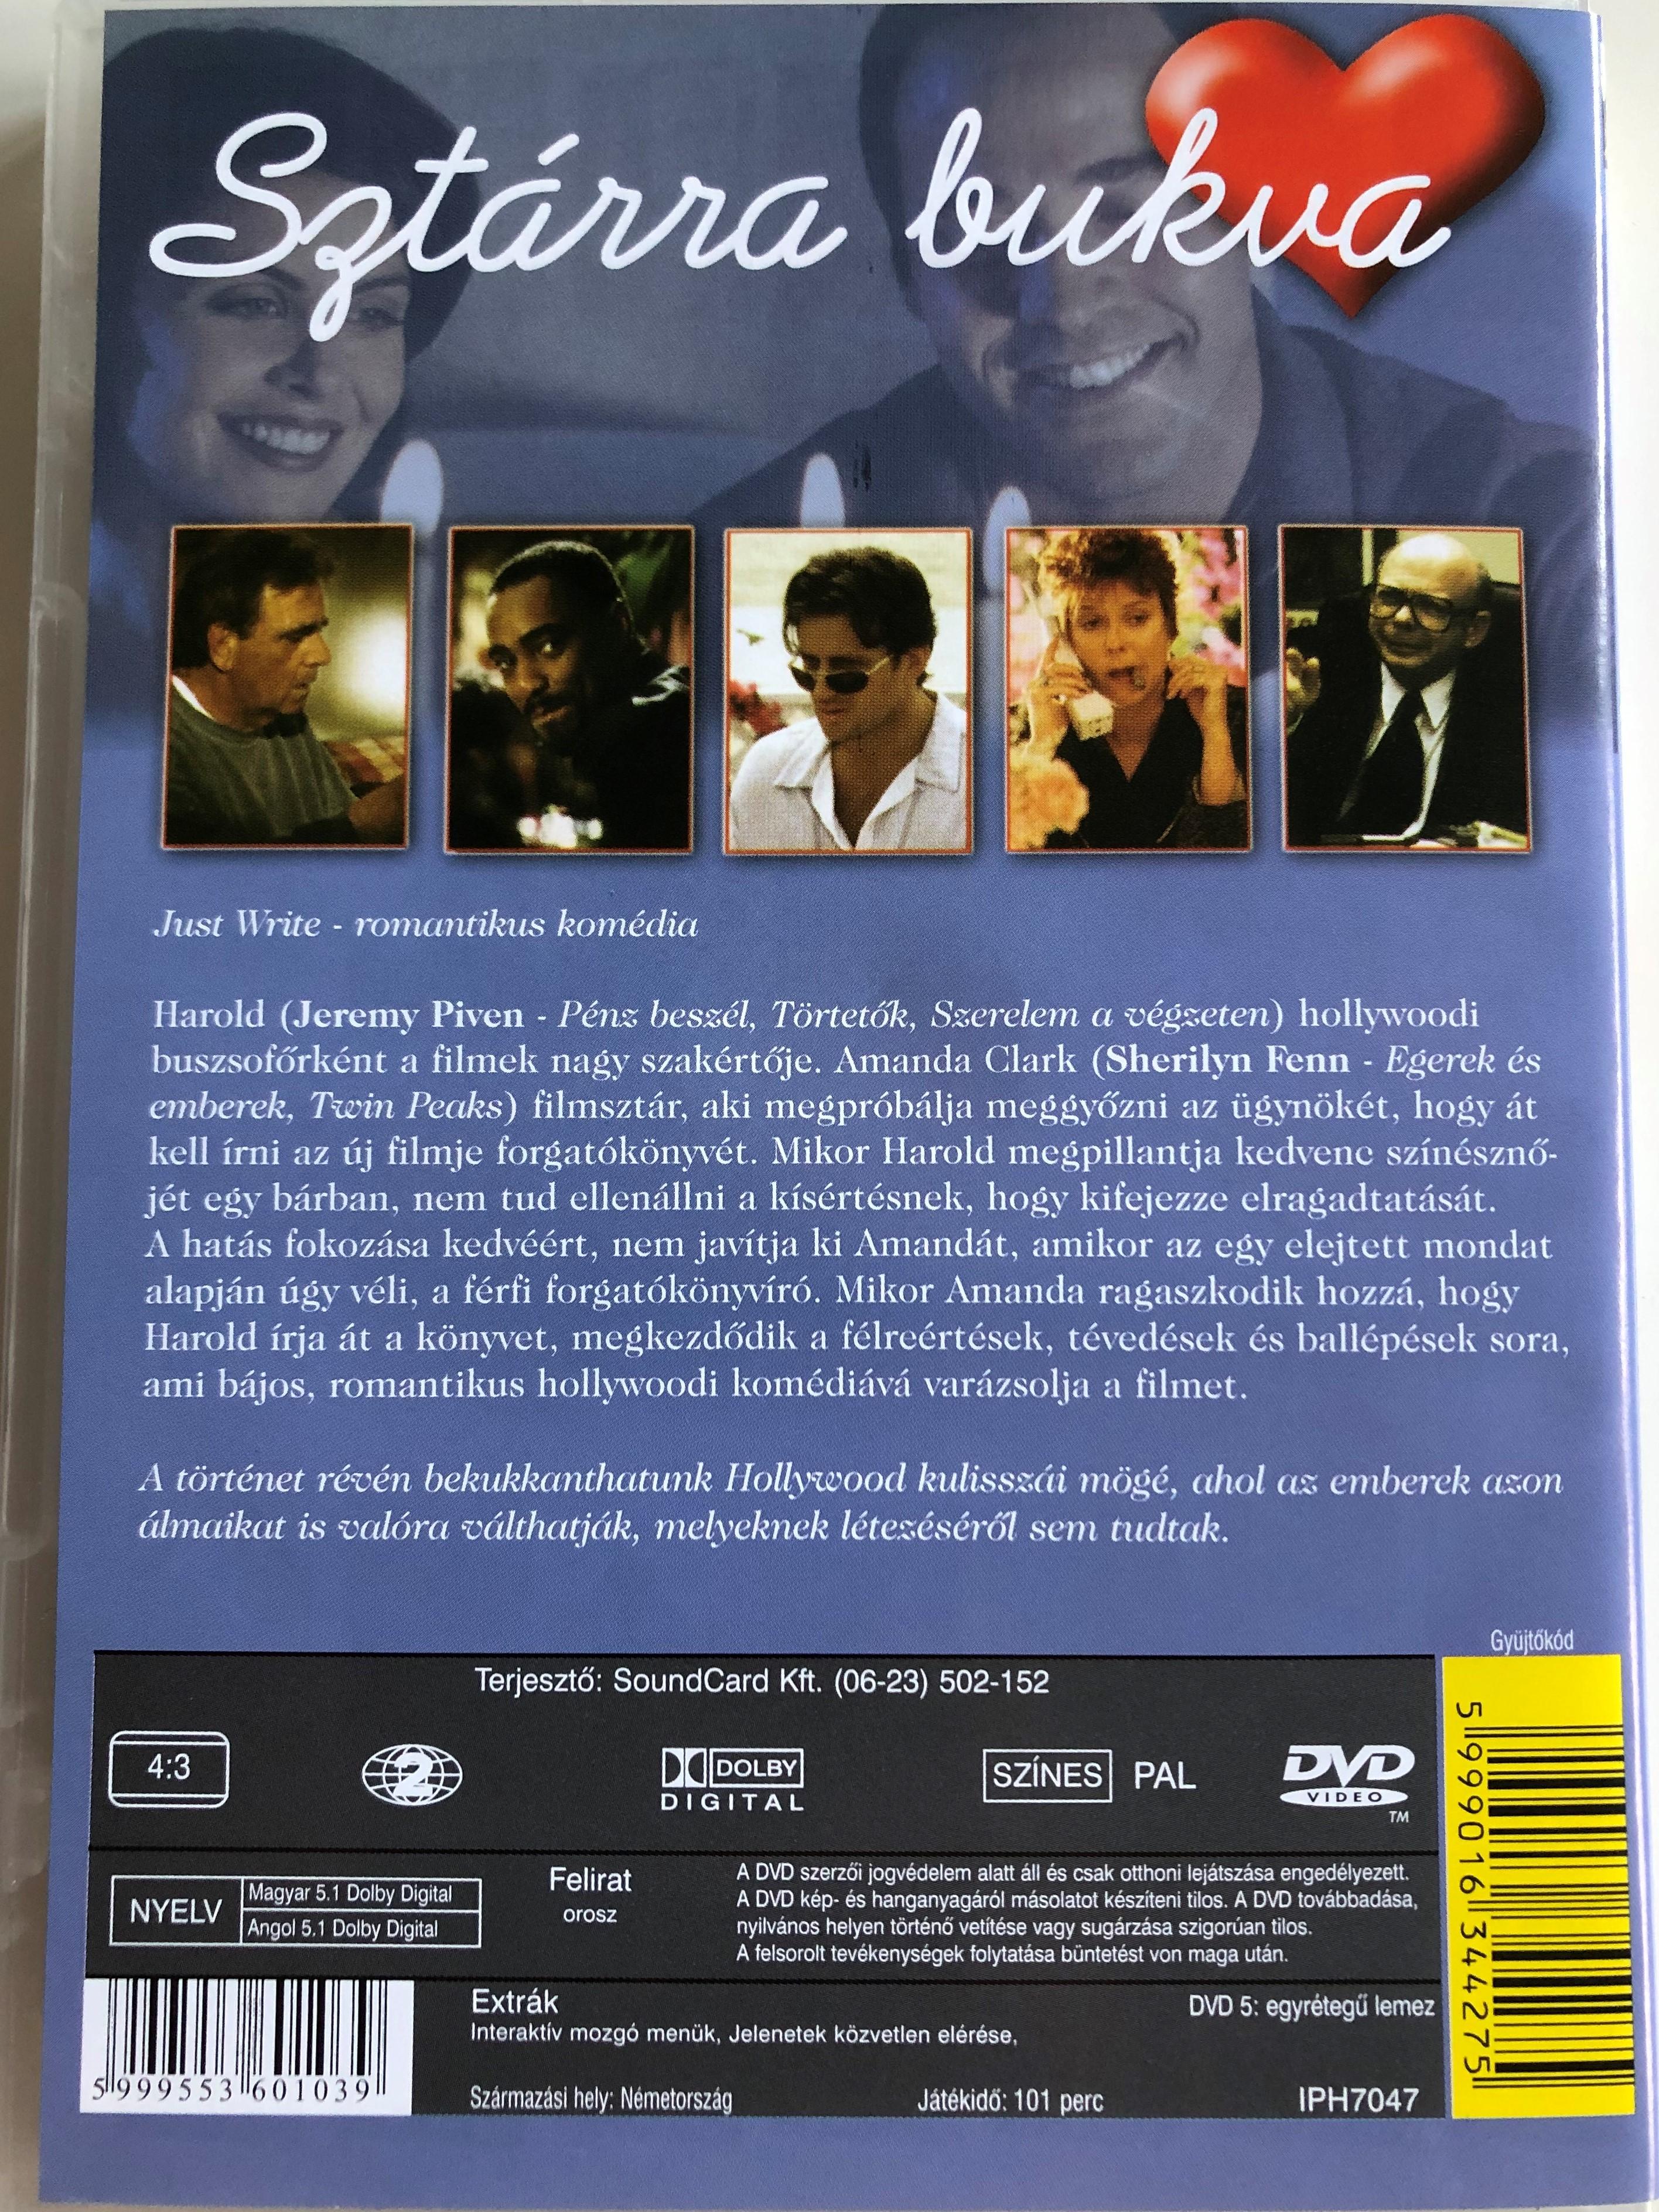 just-write-dvd-1997-szt-rra-bukva-directed-by-andrew-gallerani-starring-sherilyn-fenn-jeremy-piven-jobeth-williams-wallace-shawn-alex-rocco-yeardley-smith-holland-taylor-2-.jpg